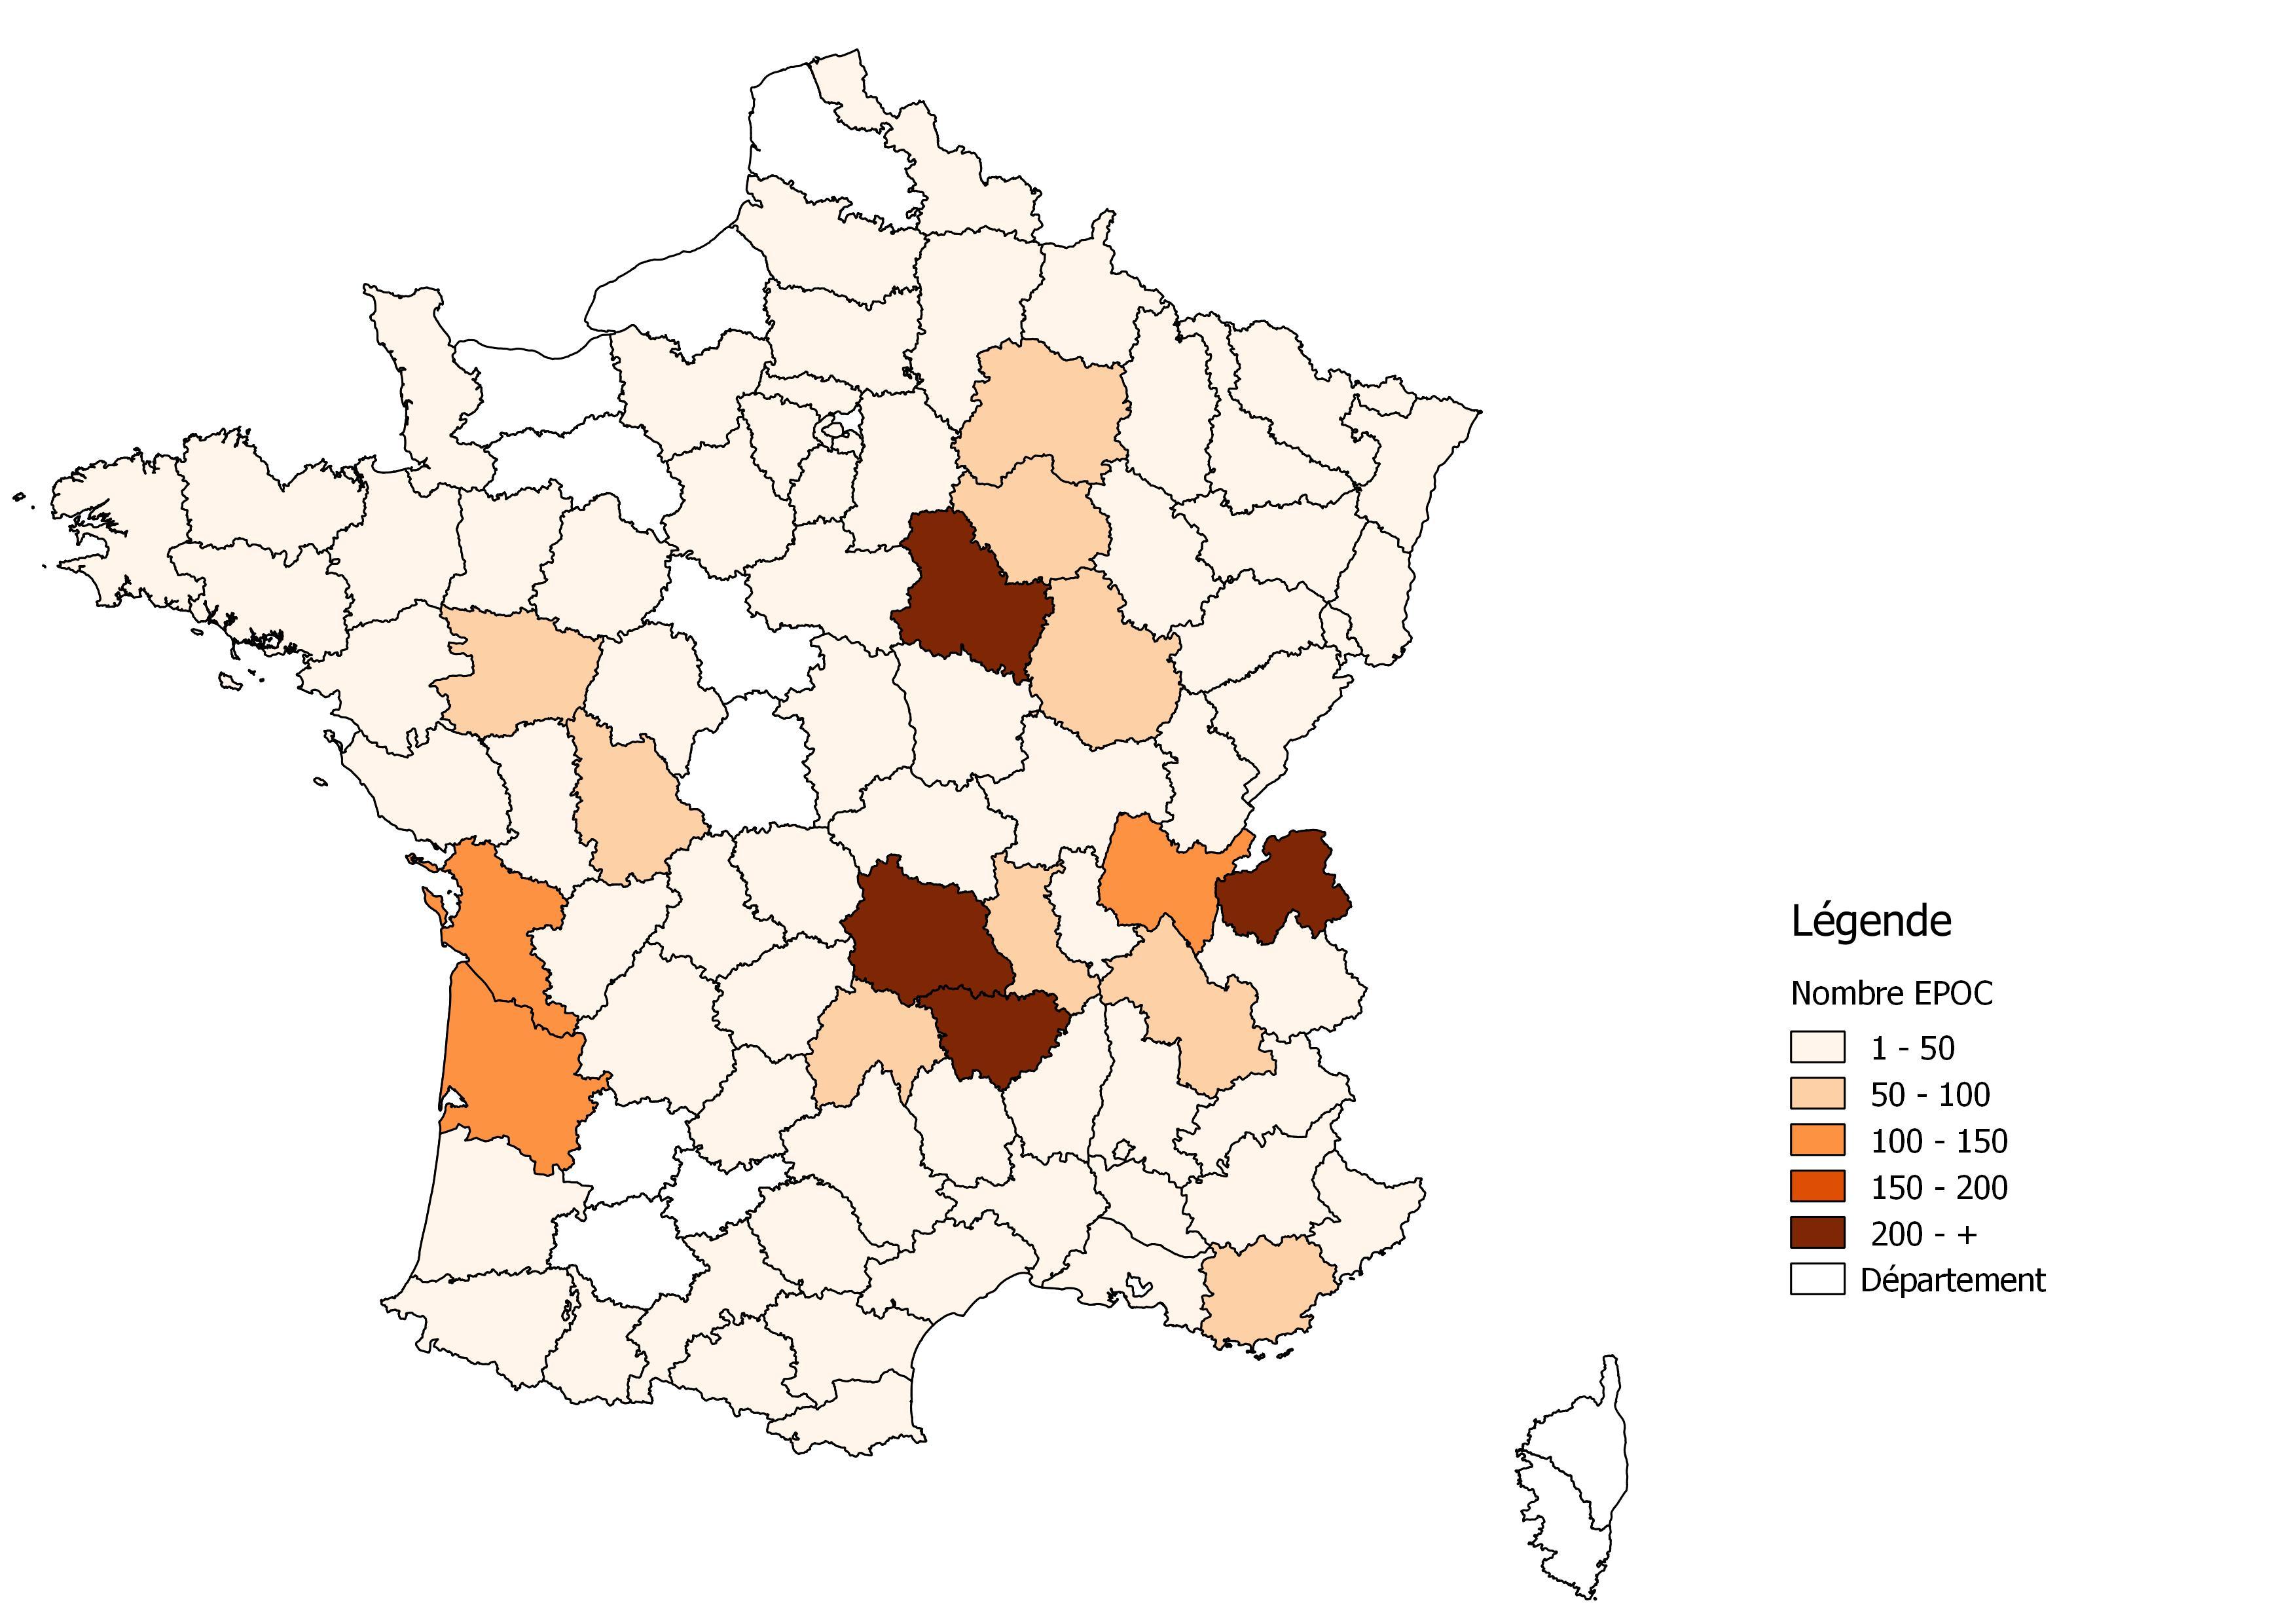 https://cdnfiles1.biolovision.net/www.faune-france.org/userfiles/pardpartementlast.jpeg